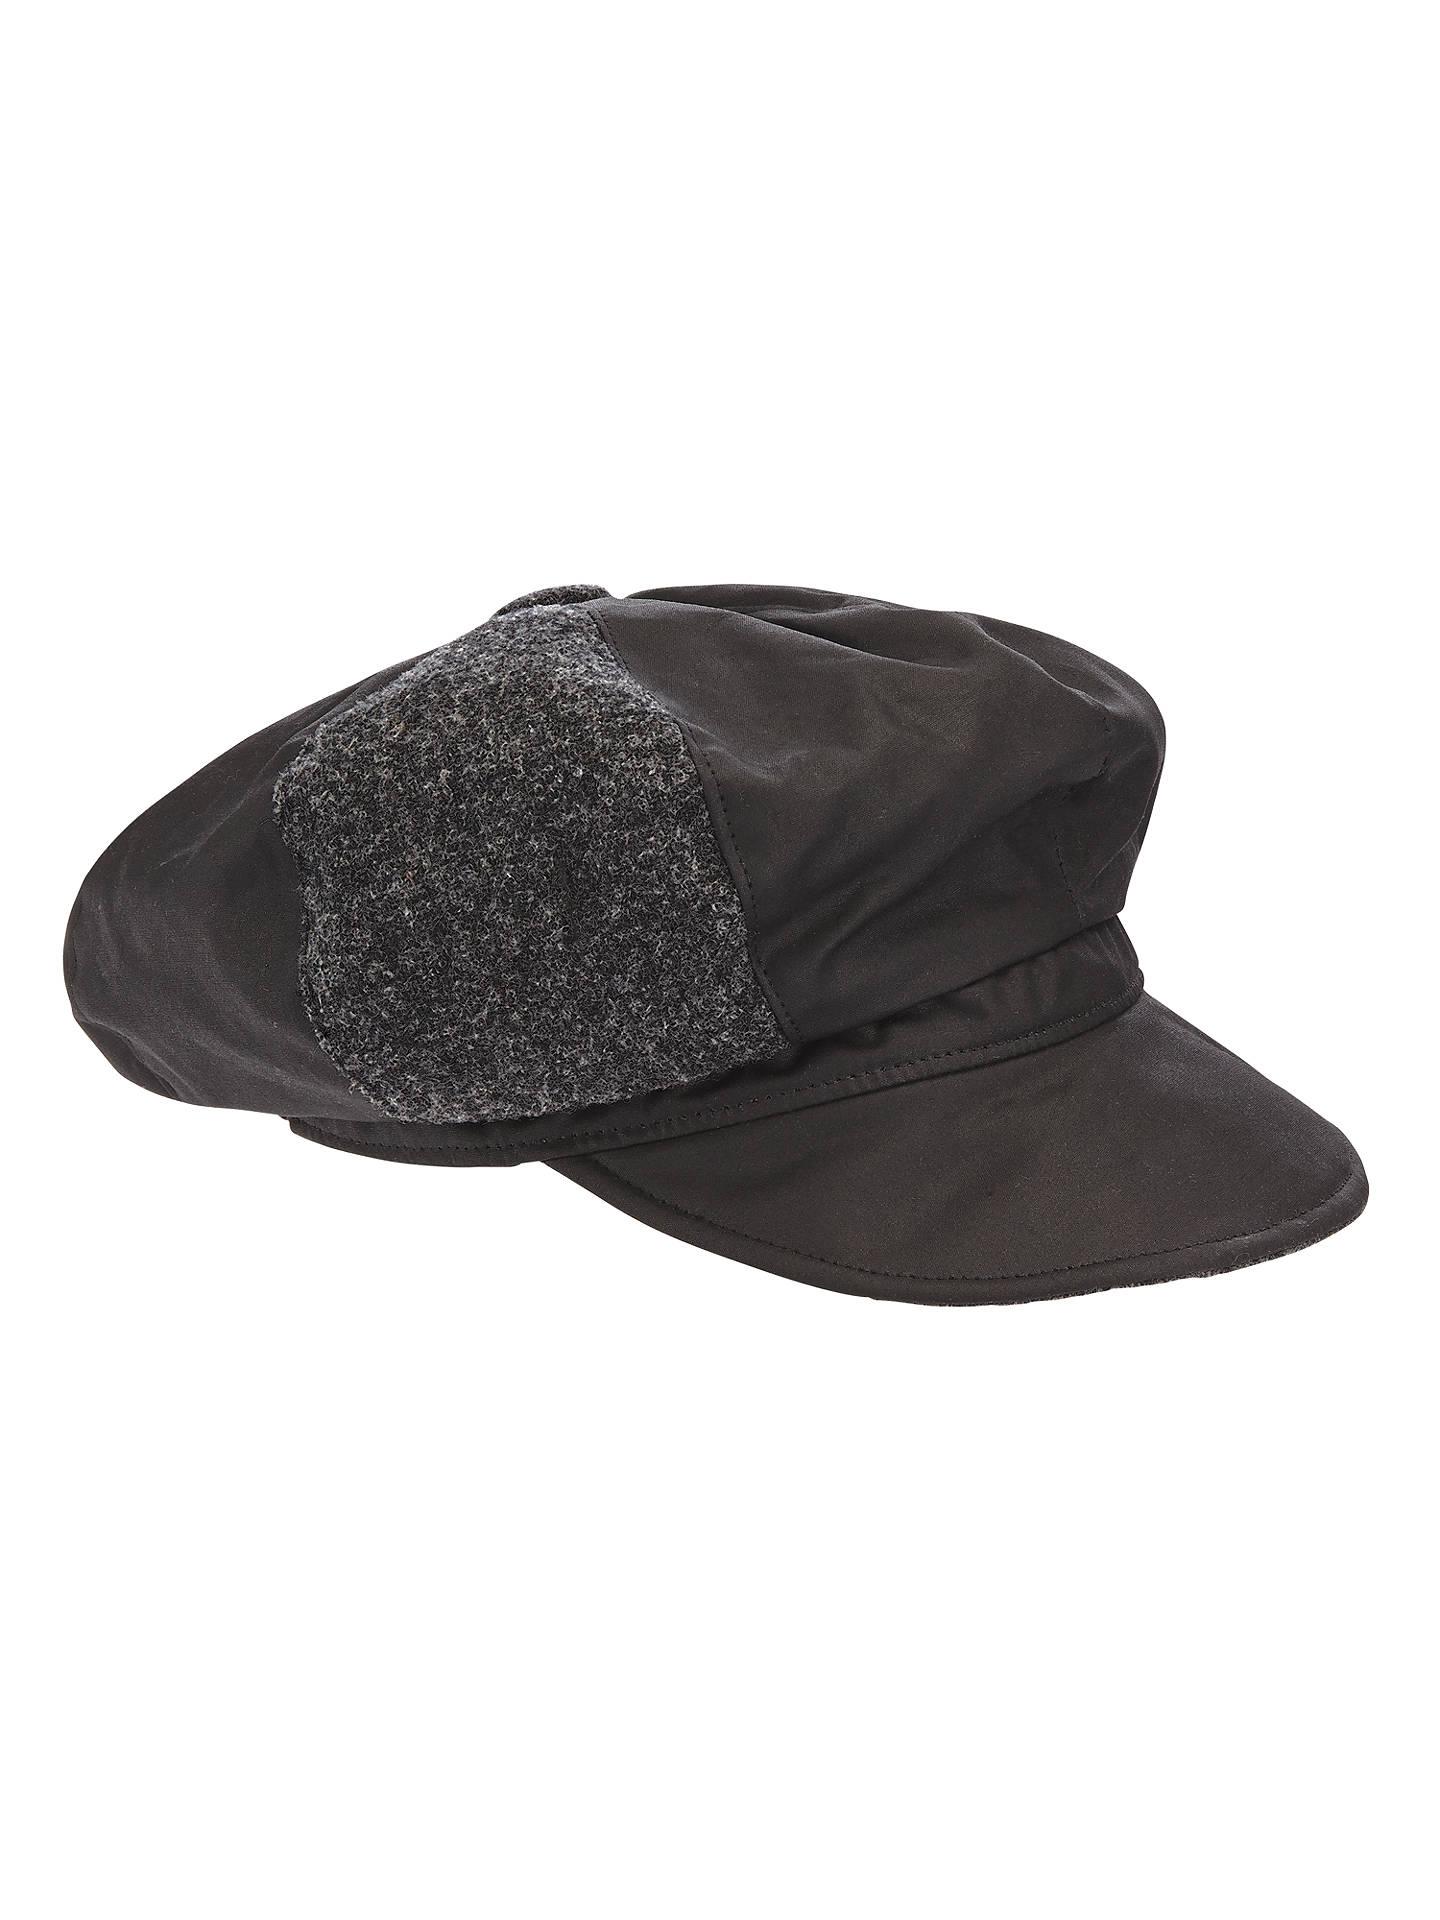 BuyOlney Ellie Tweed Waxed Cotton Bakerboy Rain Hat 2ac0aabfebf